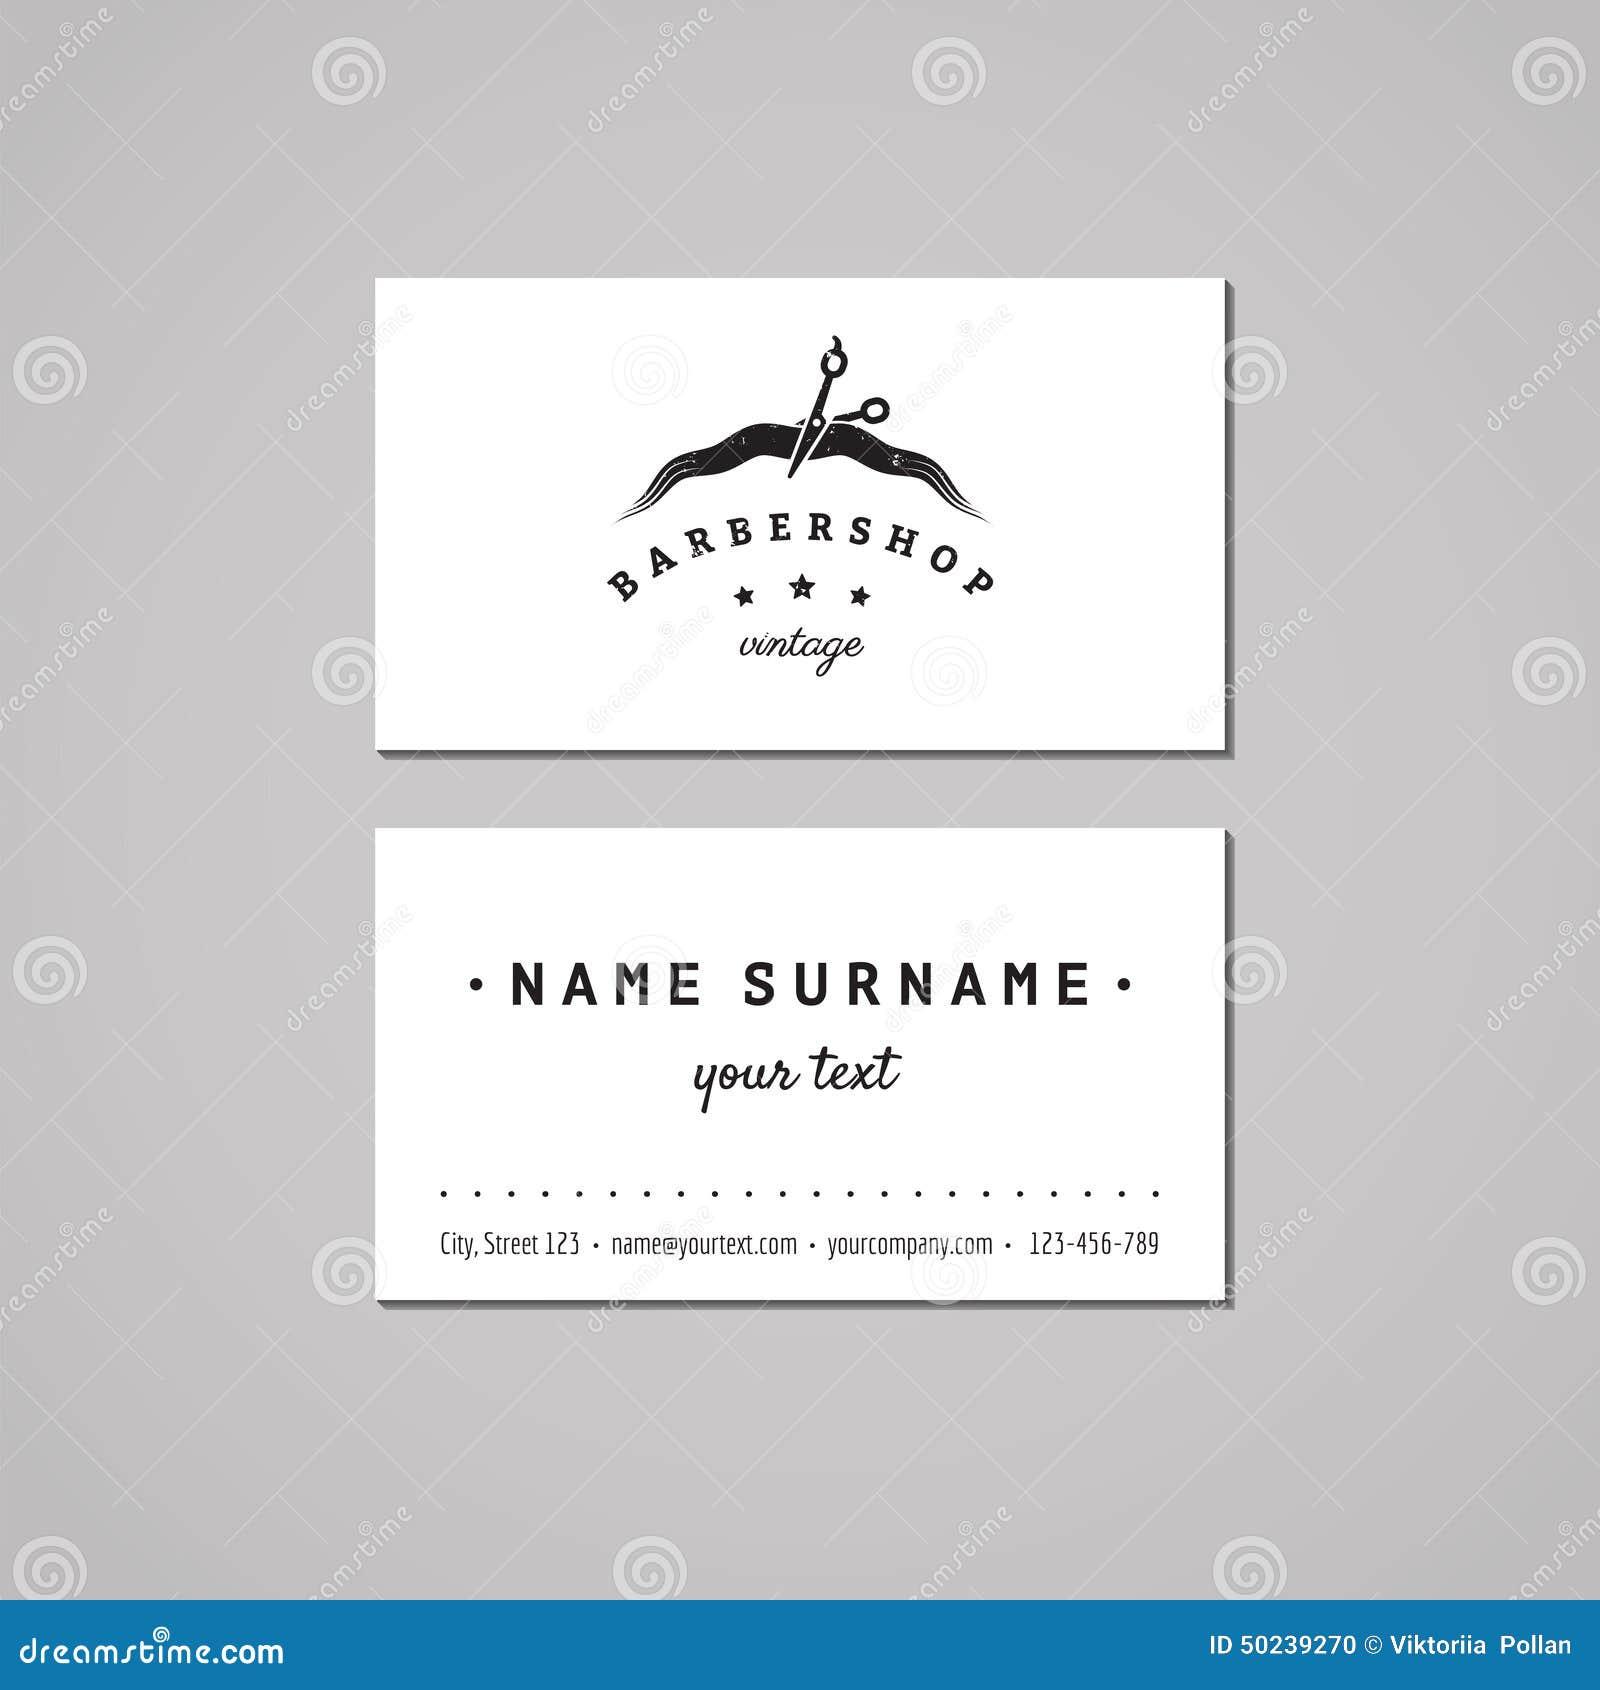 Barbershop Business Card Design Concept. Barbershop Logo With ...